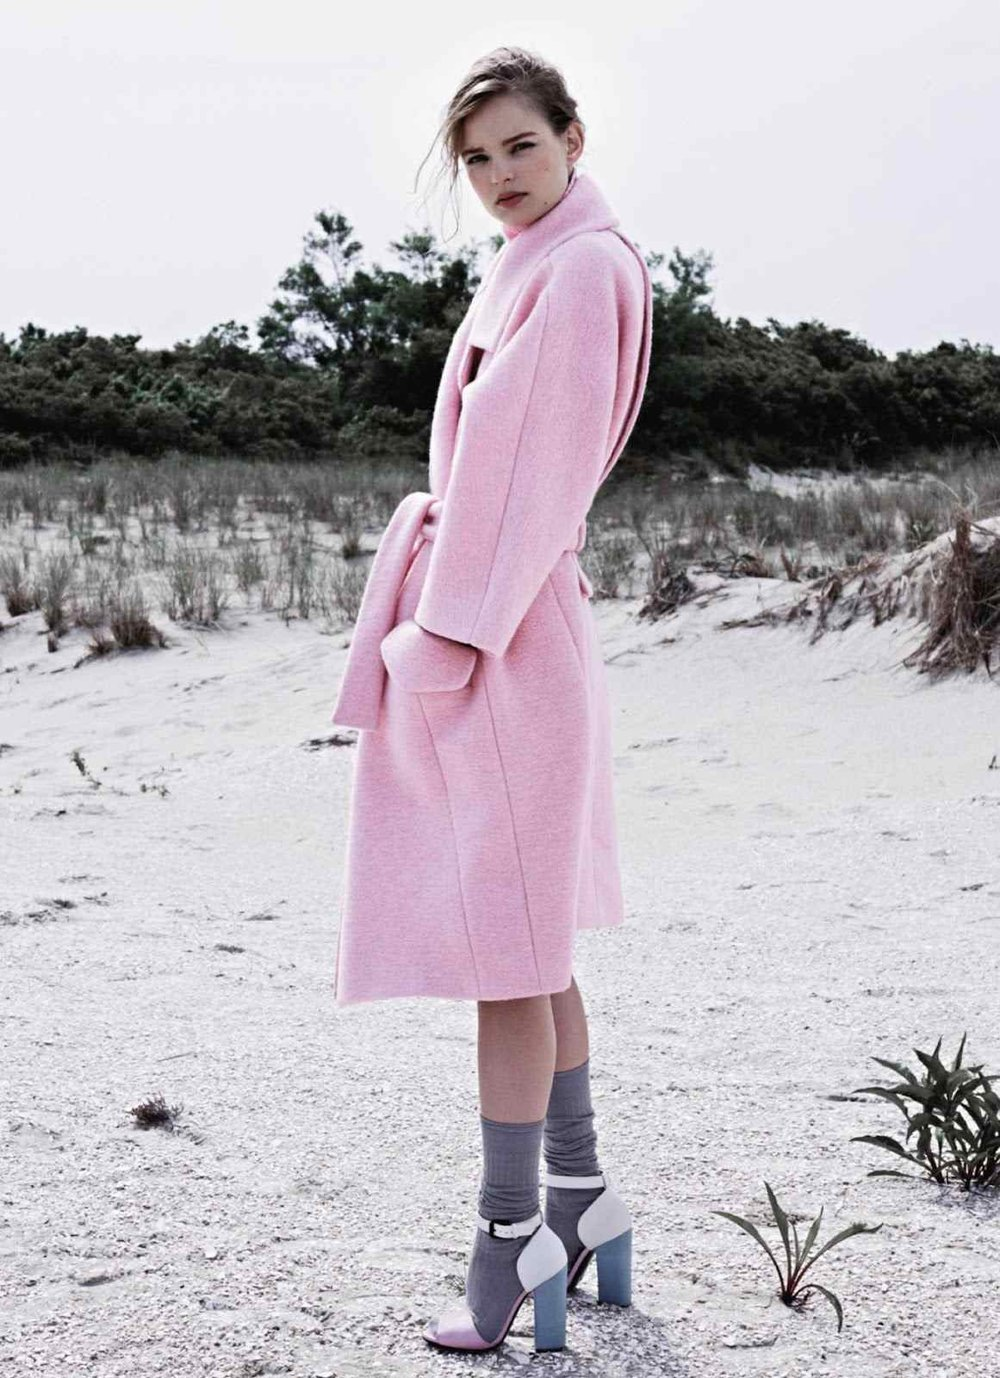 Uk_Marie_Claire_October_2013_pastel-pink-vintagesoul-australian-fashion-blog-trend-2014.jpg